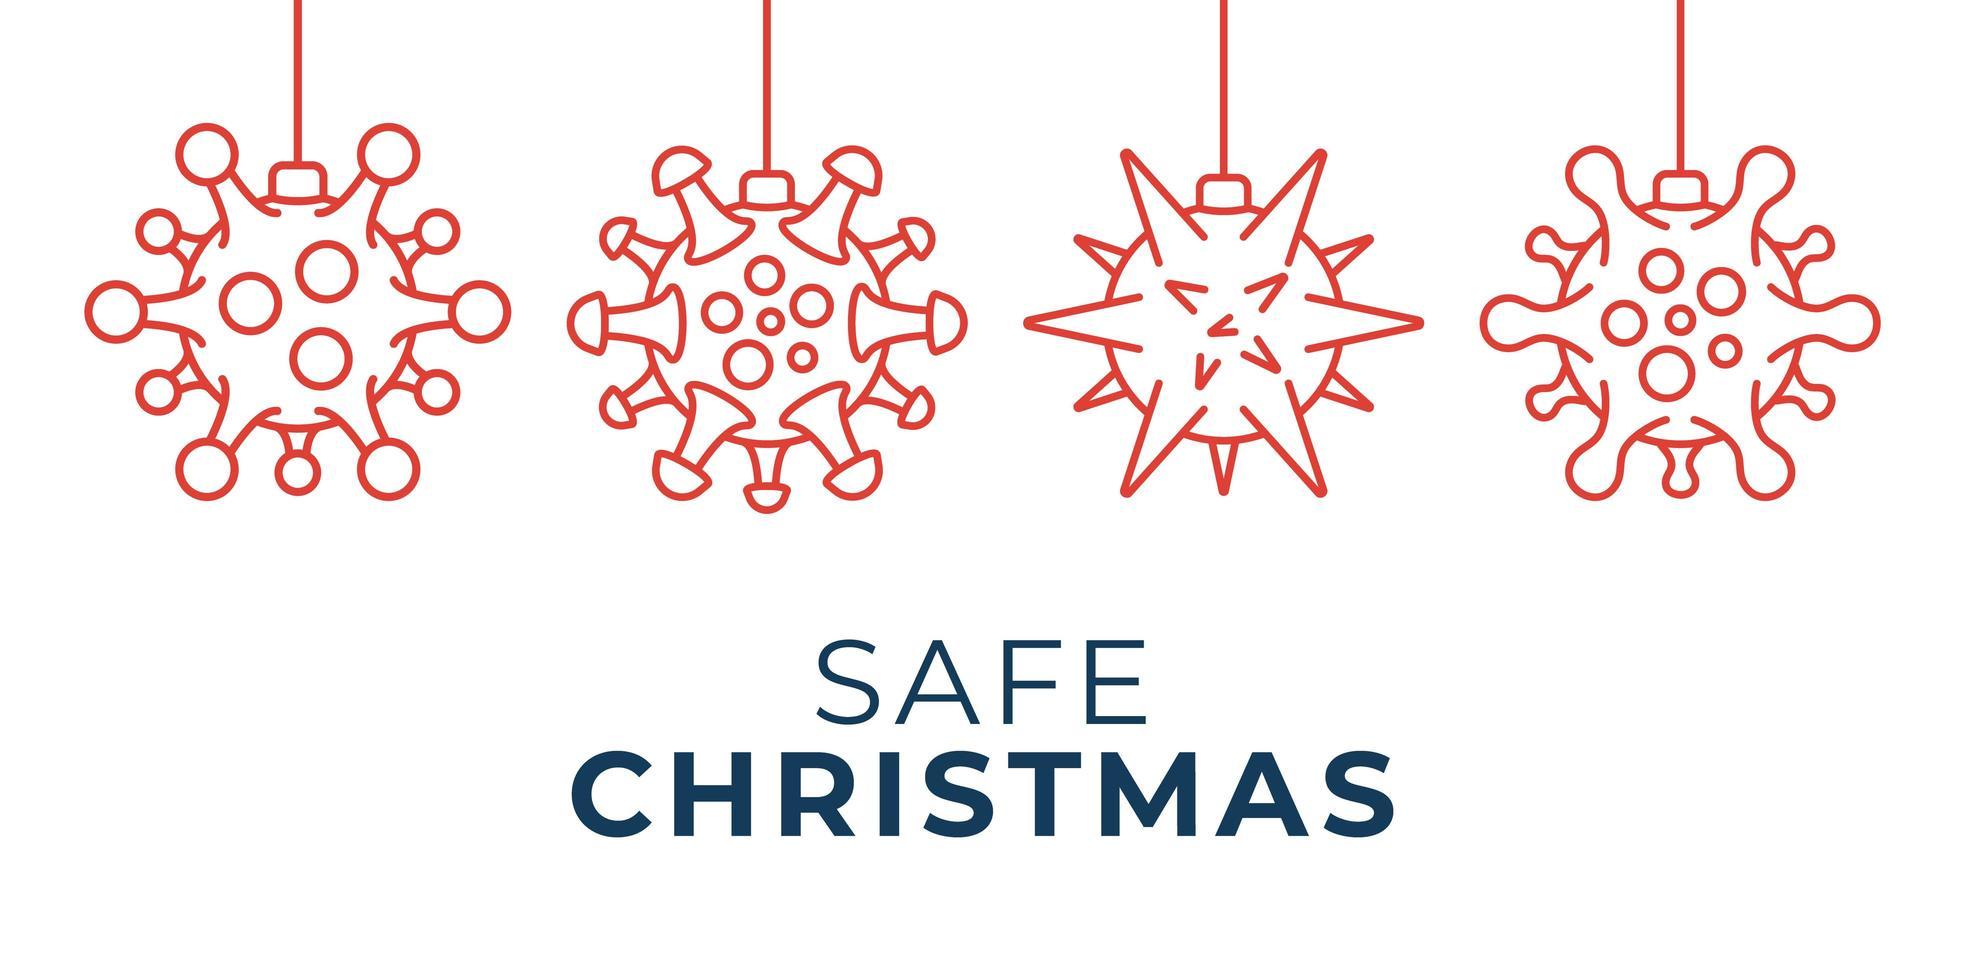 sichere Weihnachten Coronavirus Ball Ornament Banner vektor